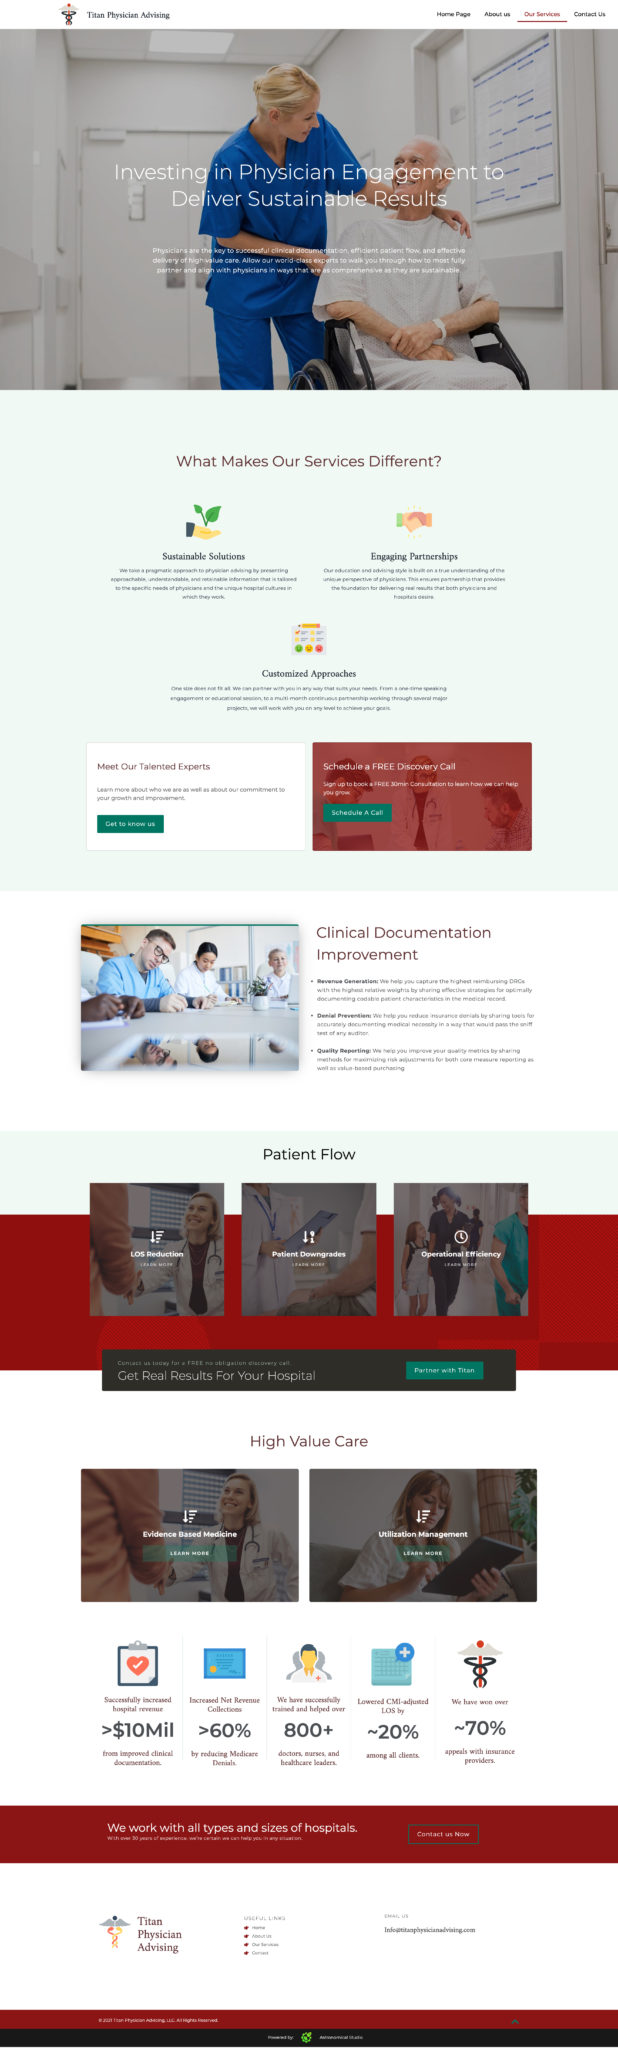 Titan-Physician-Services-Website-Design-By-Astronomical-Studio